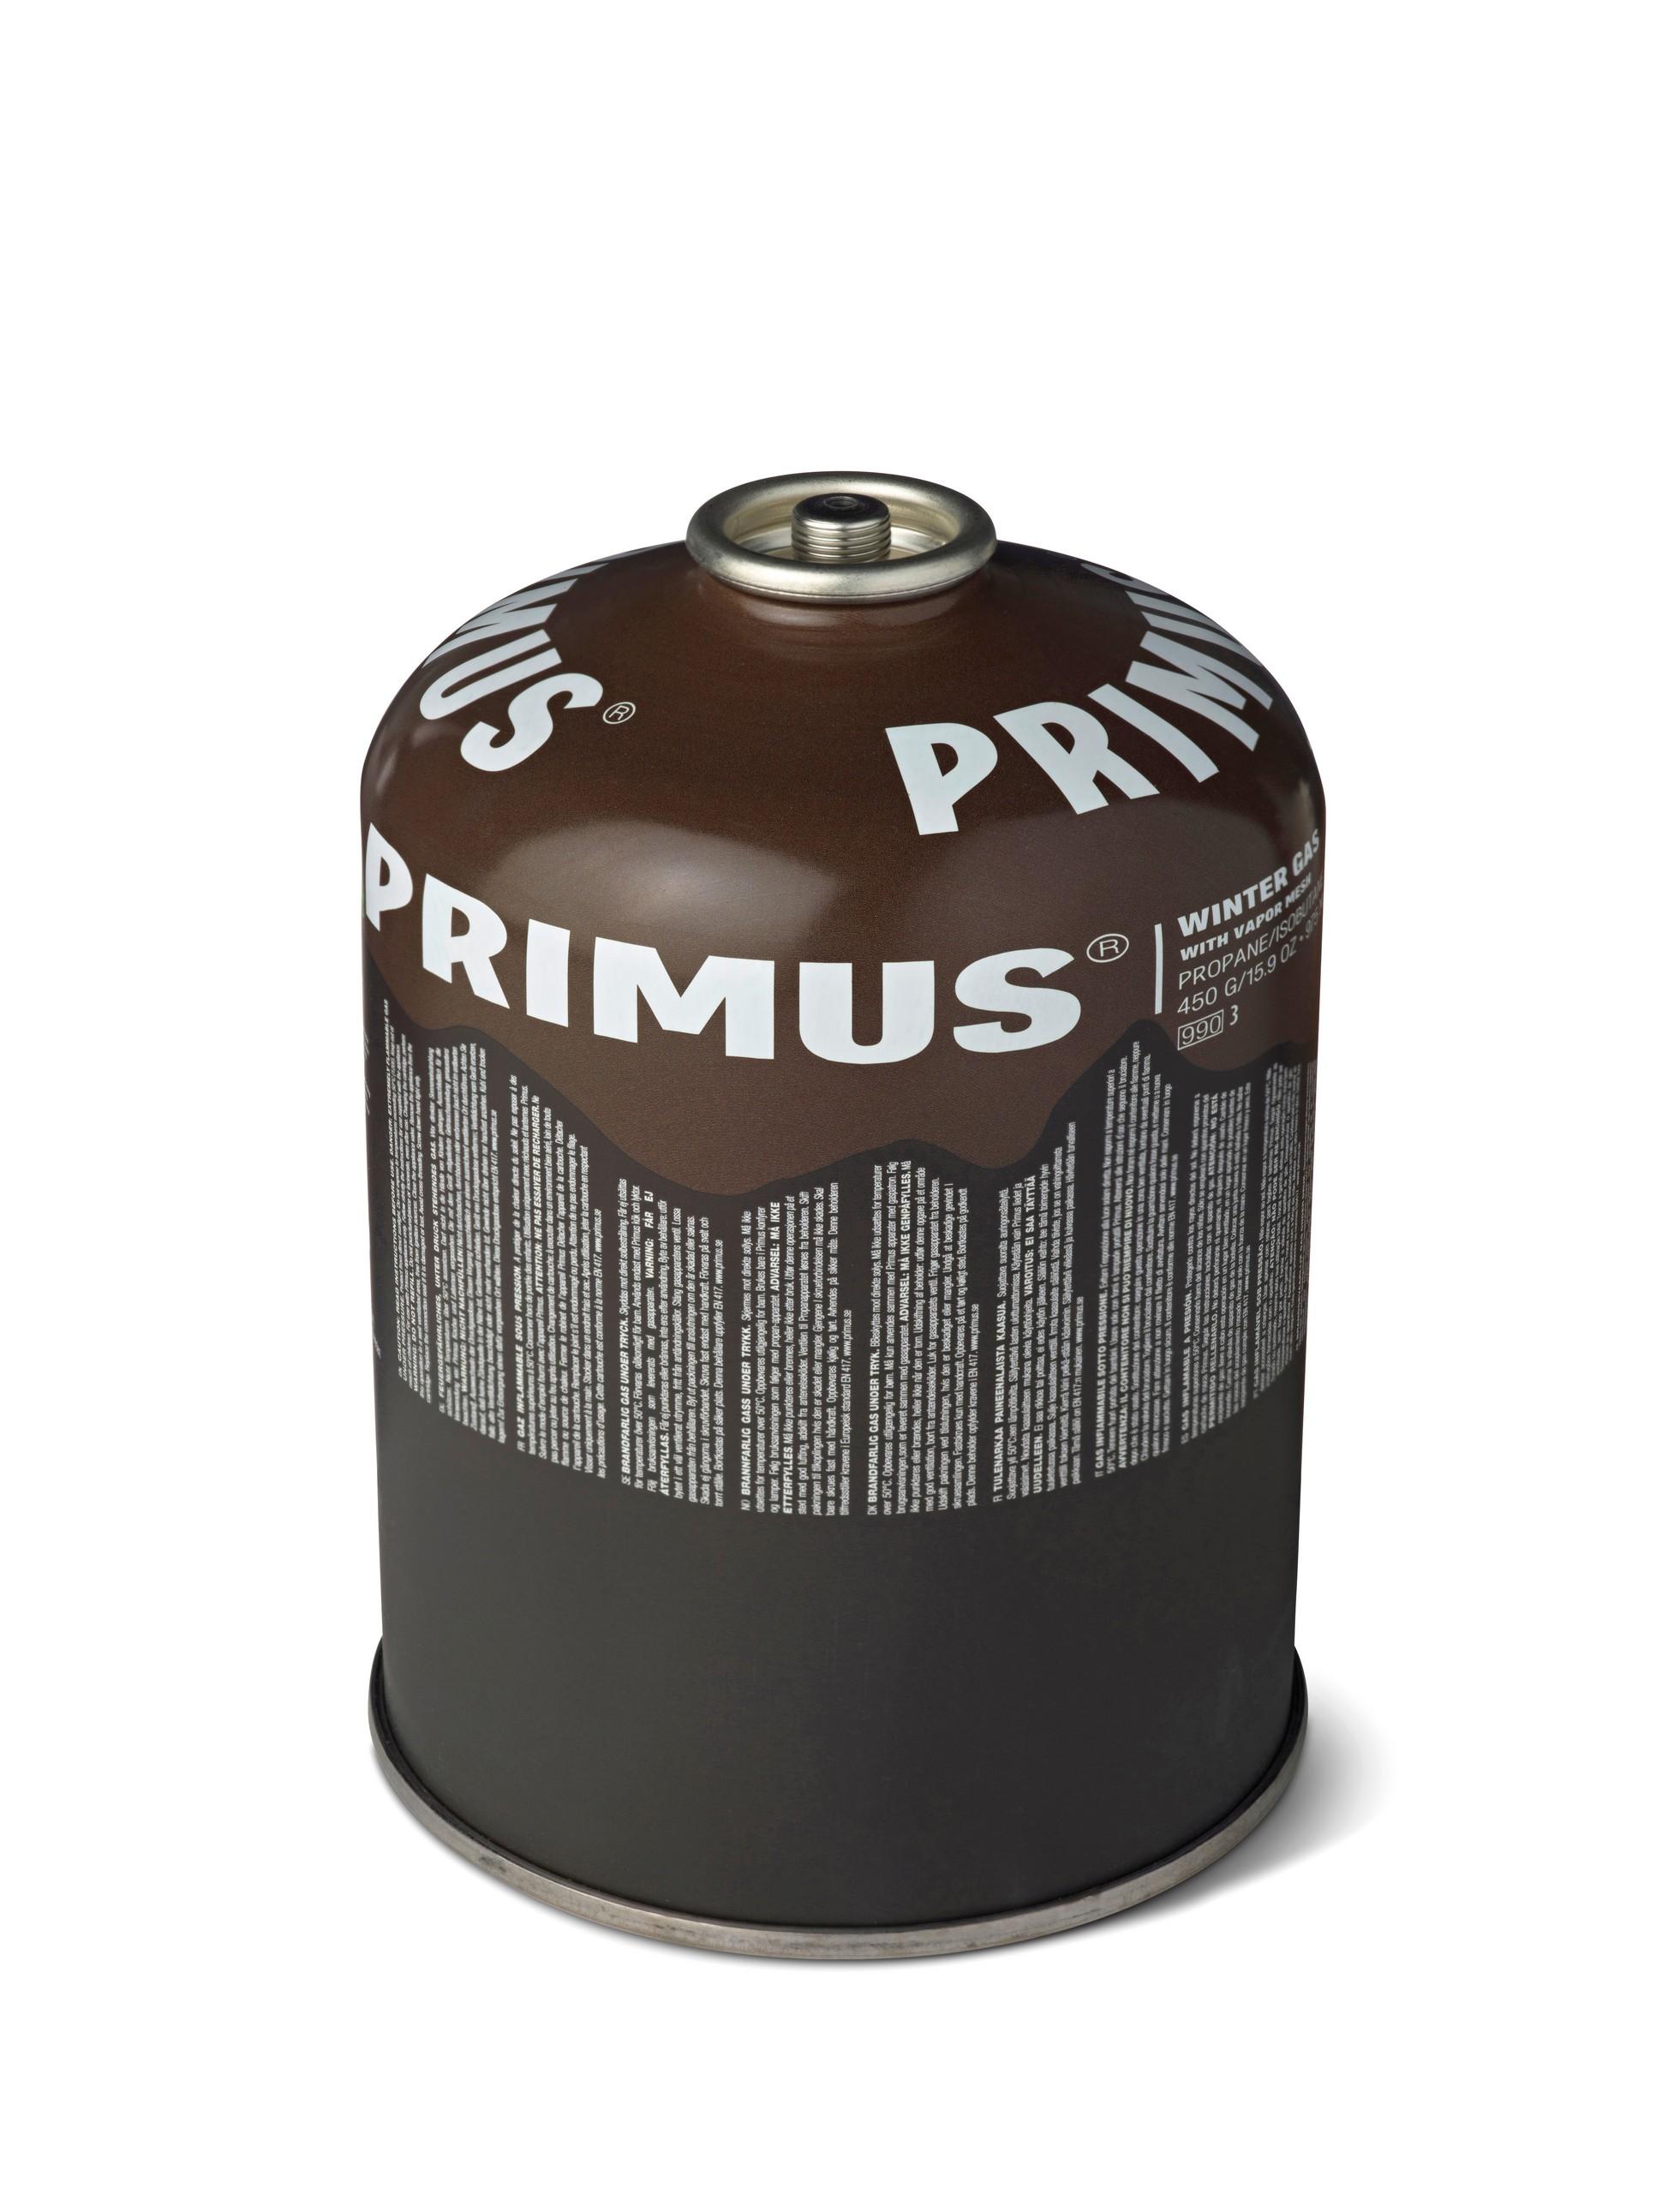 "Primus ""Winter Gas"" - 450g"